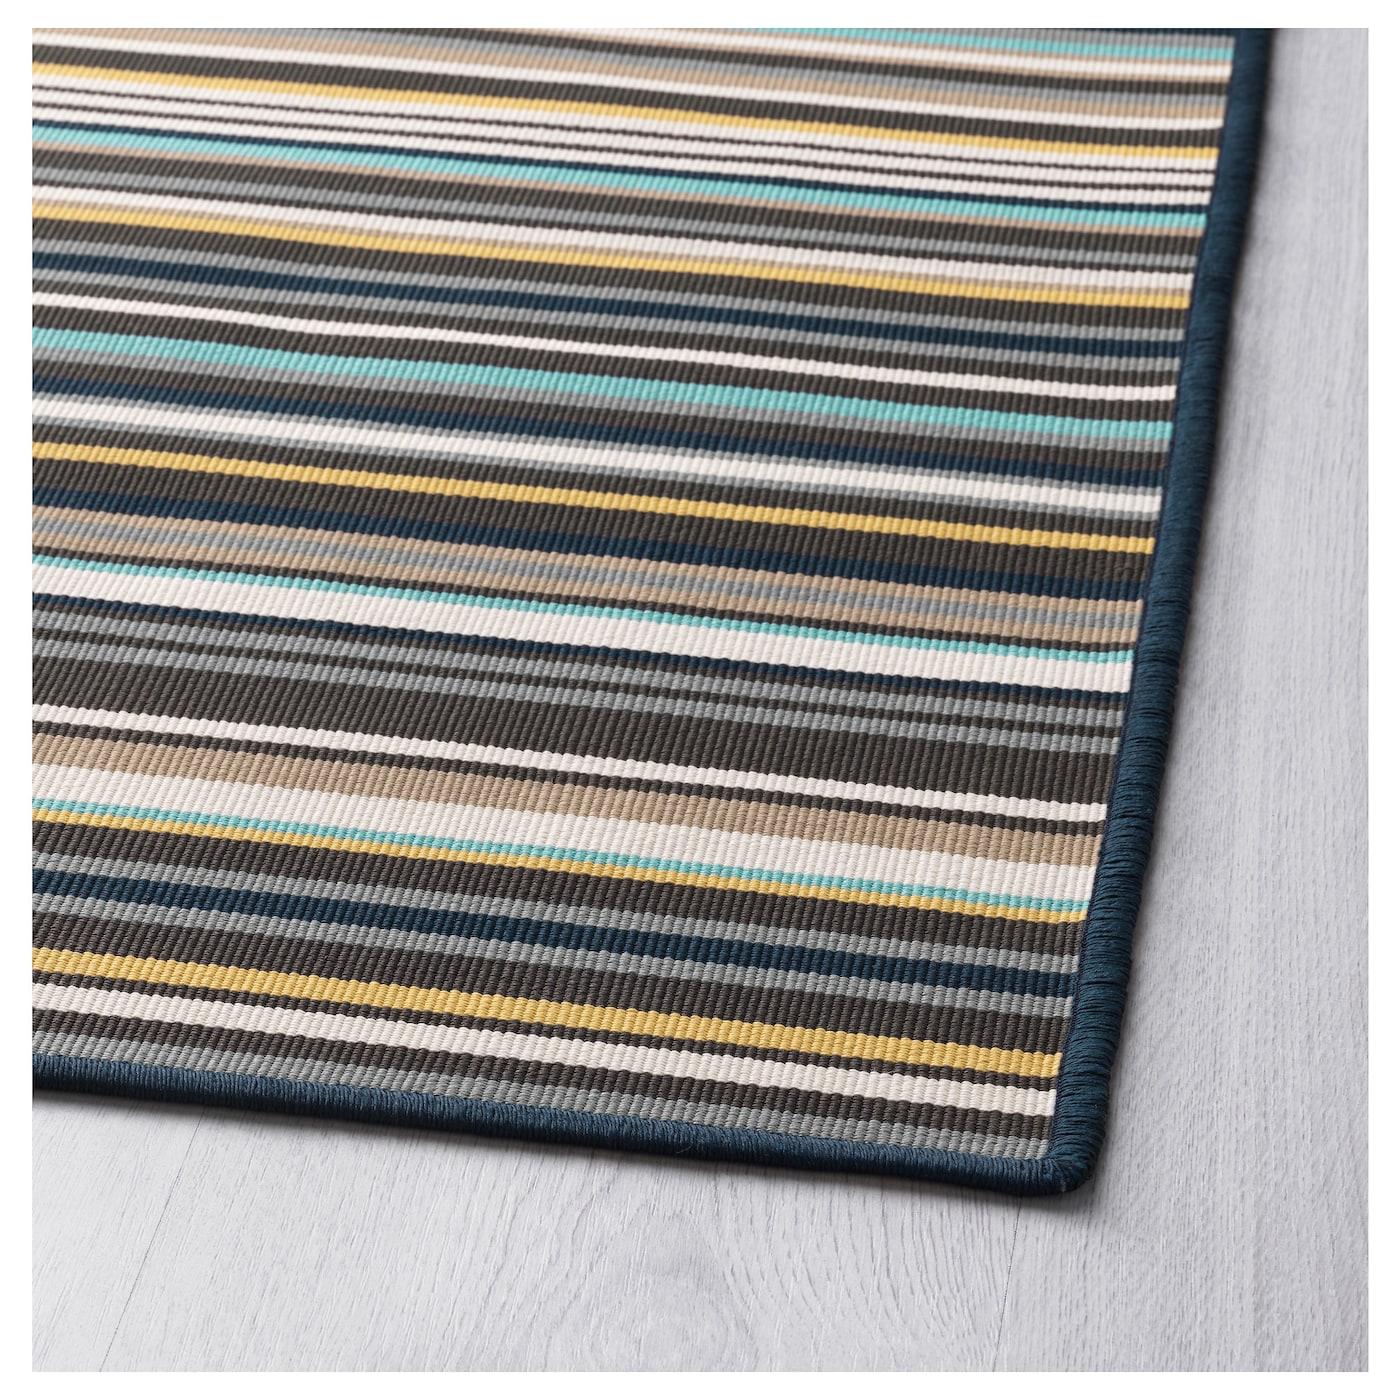 k rb k tapis tiss plat int ext rieur multicolore 133x195 cm ikea. Black Bedroom Furniture Sets. Home Design Ideas